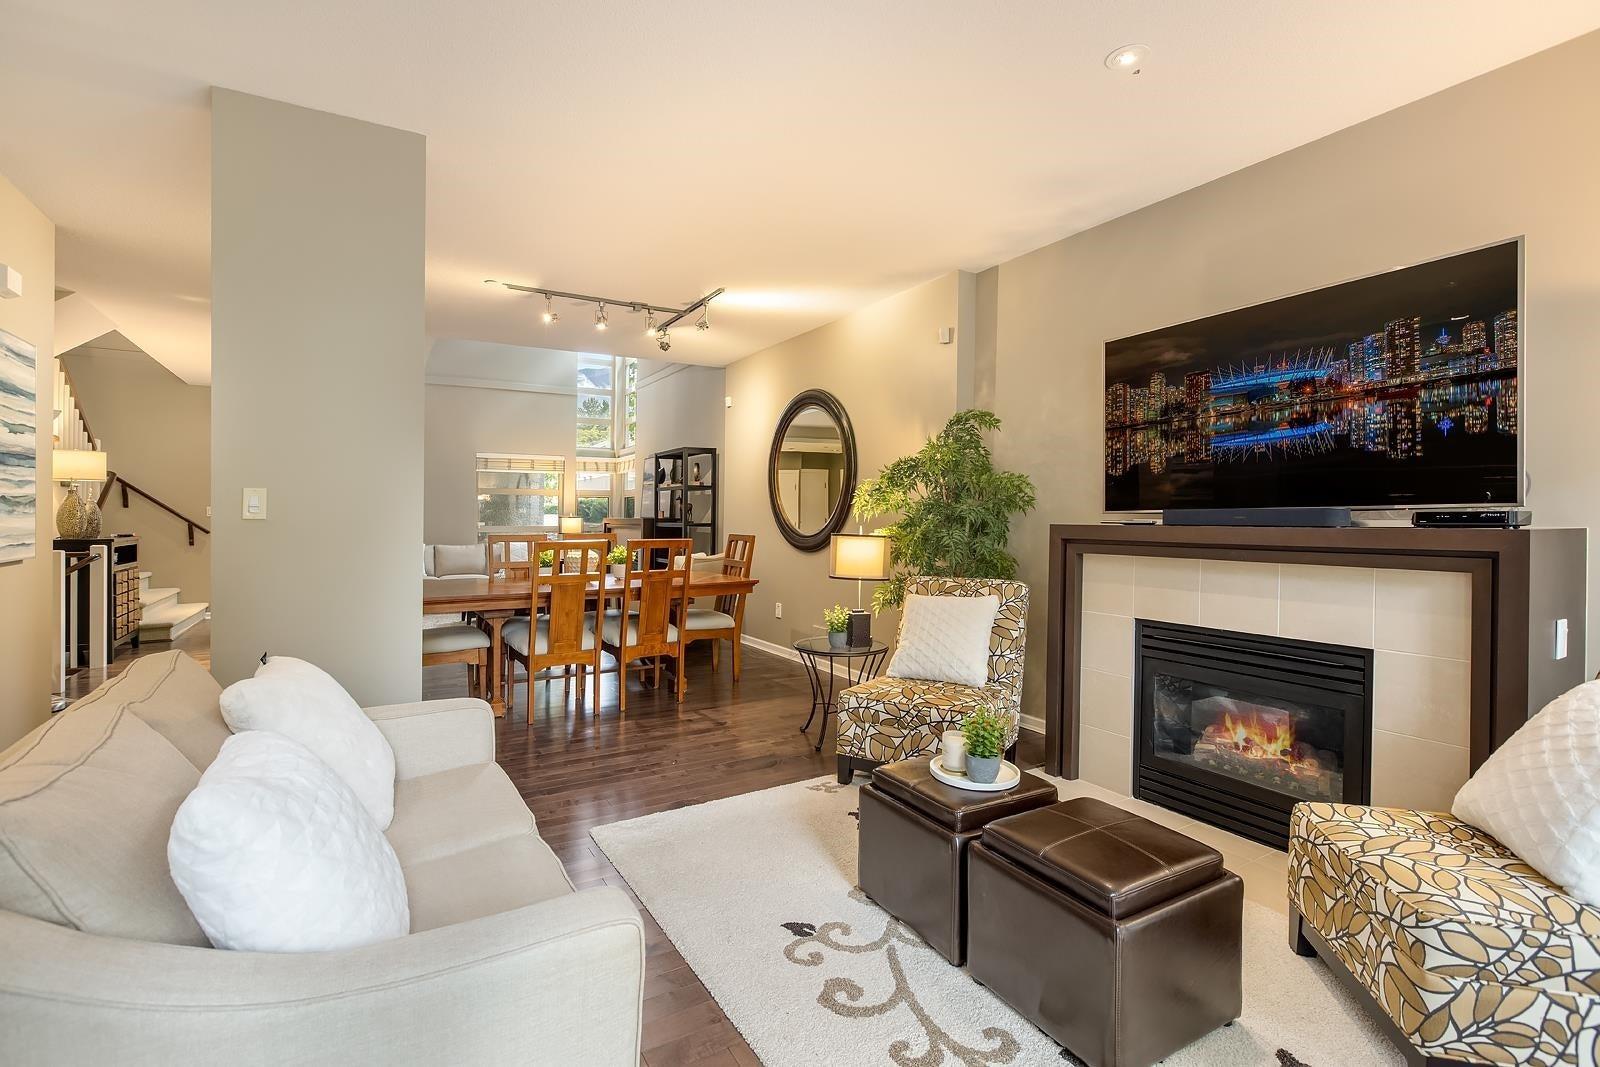 6 3750 EDGEMONT BOULEVARD - Edgemont Townhouse for sale, 4 Bedrooms (R2617117) - #8